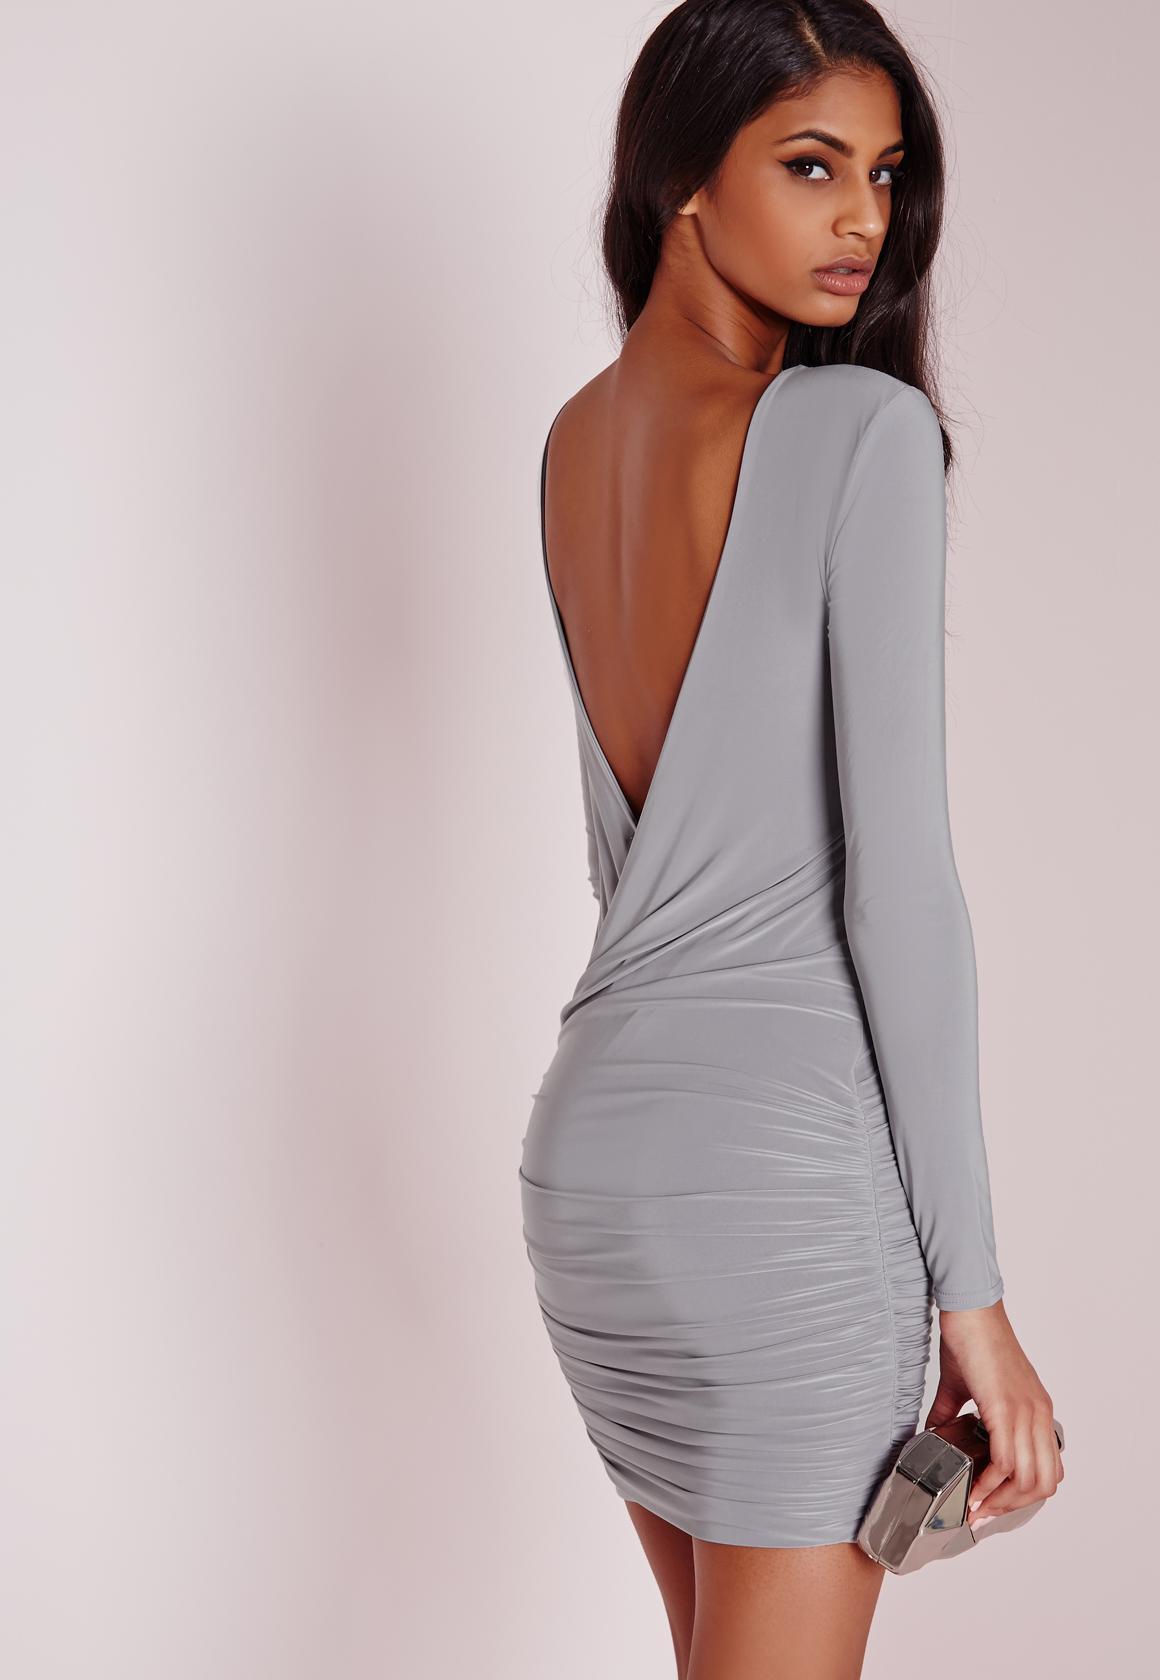 Bodycon dress for skinny girl to girls ebay perth perth